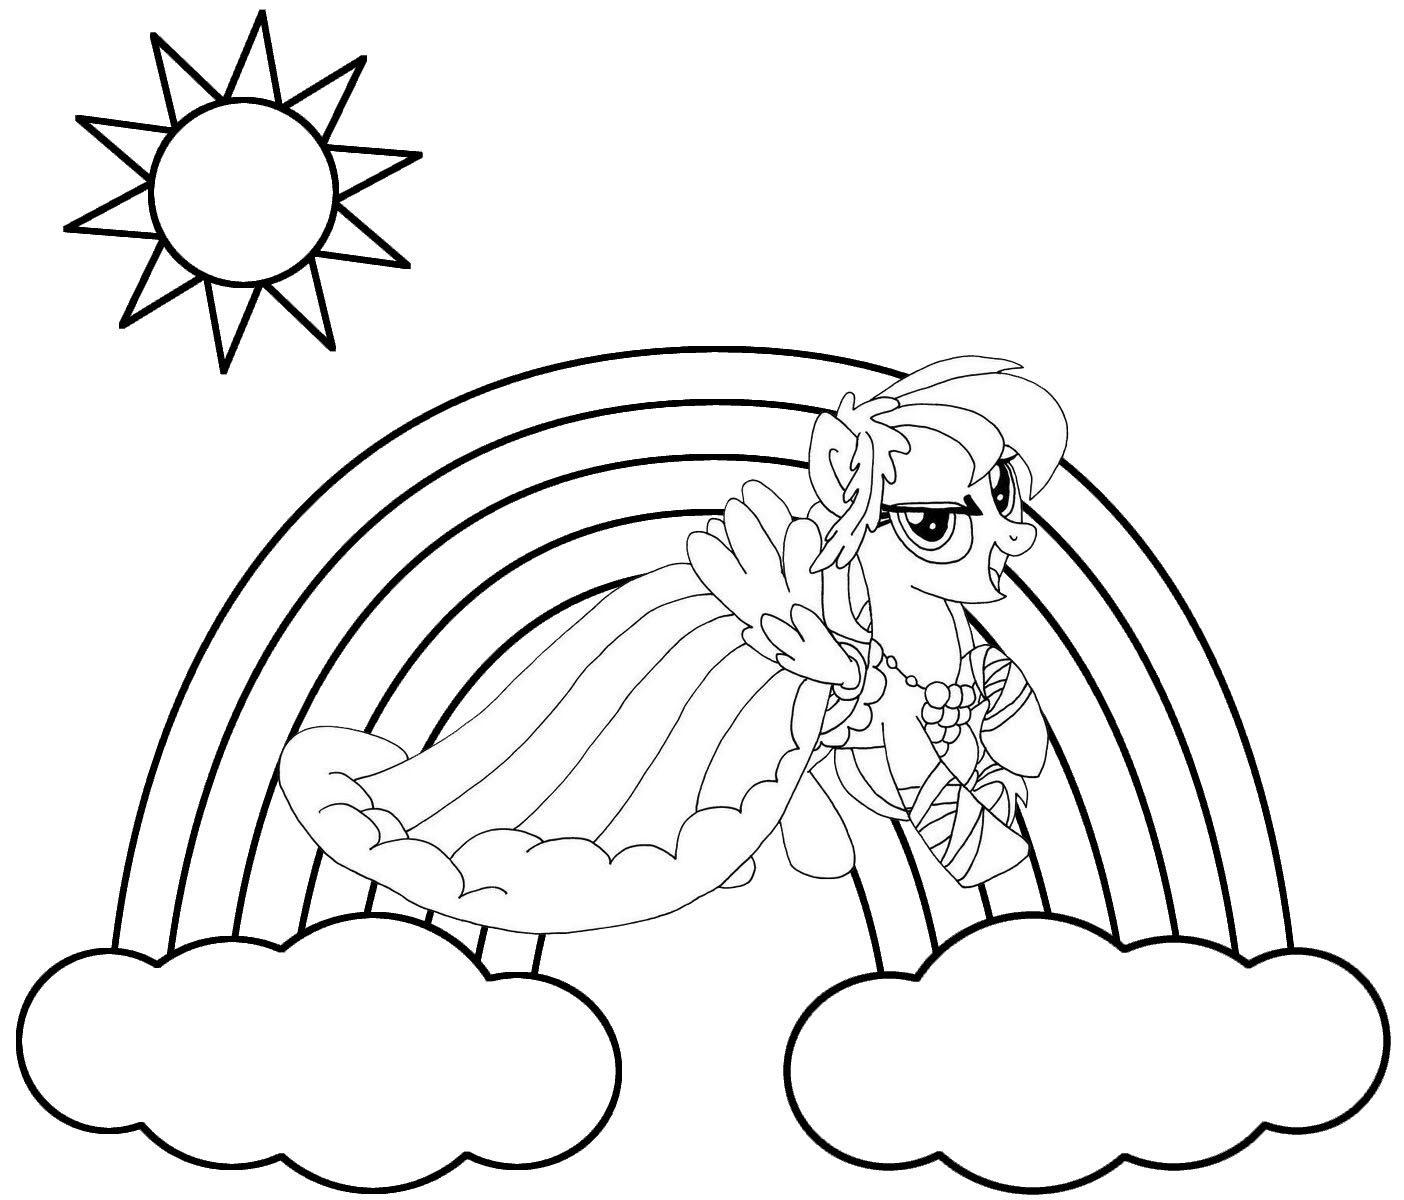 Rainbow Dash Mlp Friendship Is Magic Series Coloring Sheet